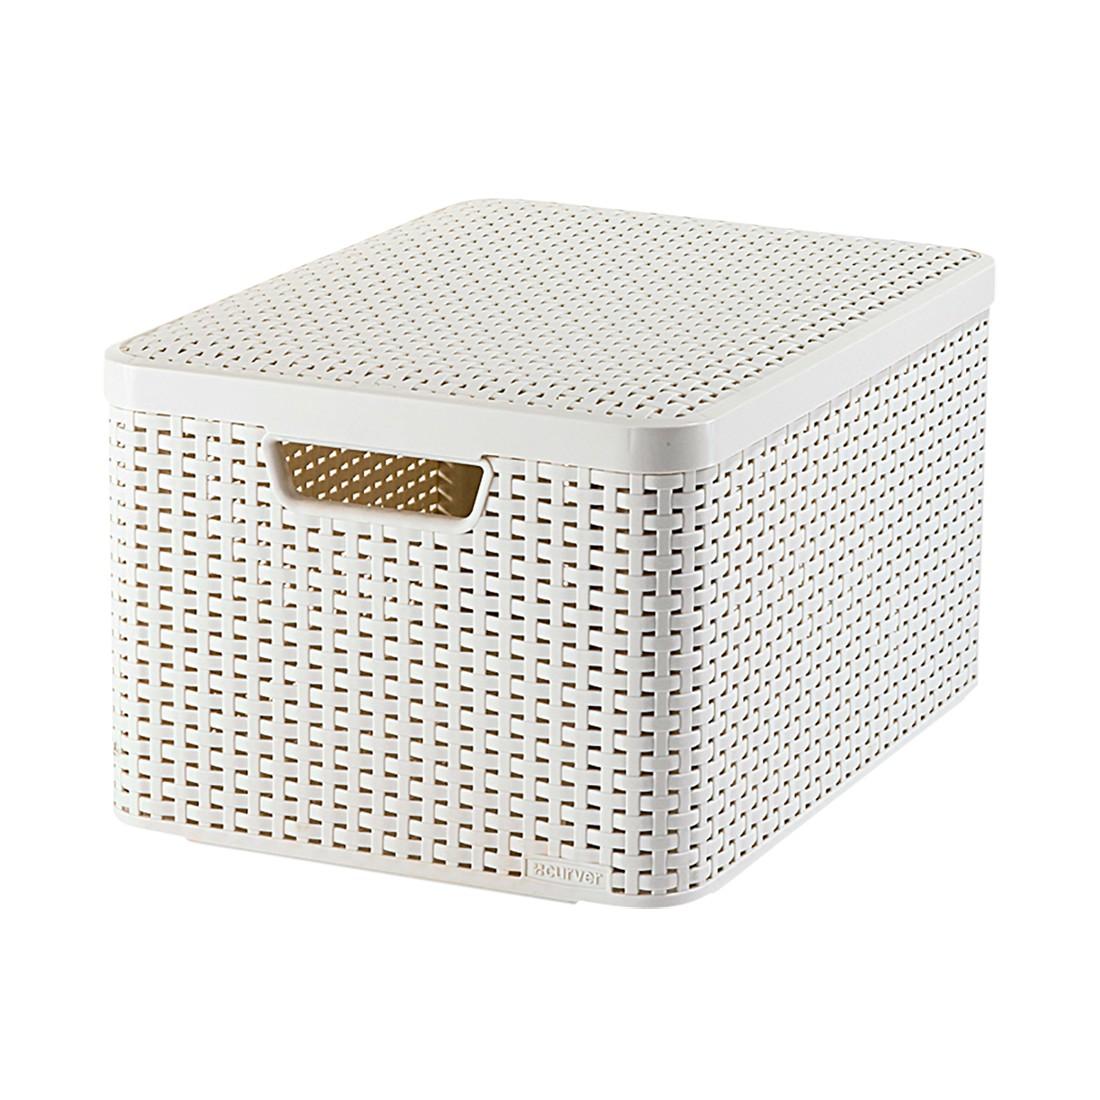 Box Style – Kunststoff Cremé – 19,8 cm 7 Liter 14,2 cm 29,1 cm, Curver jetzt kaufen